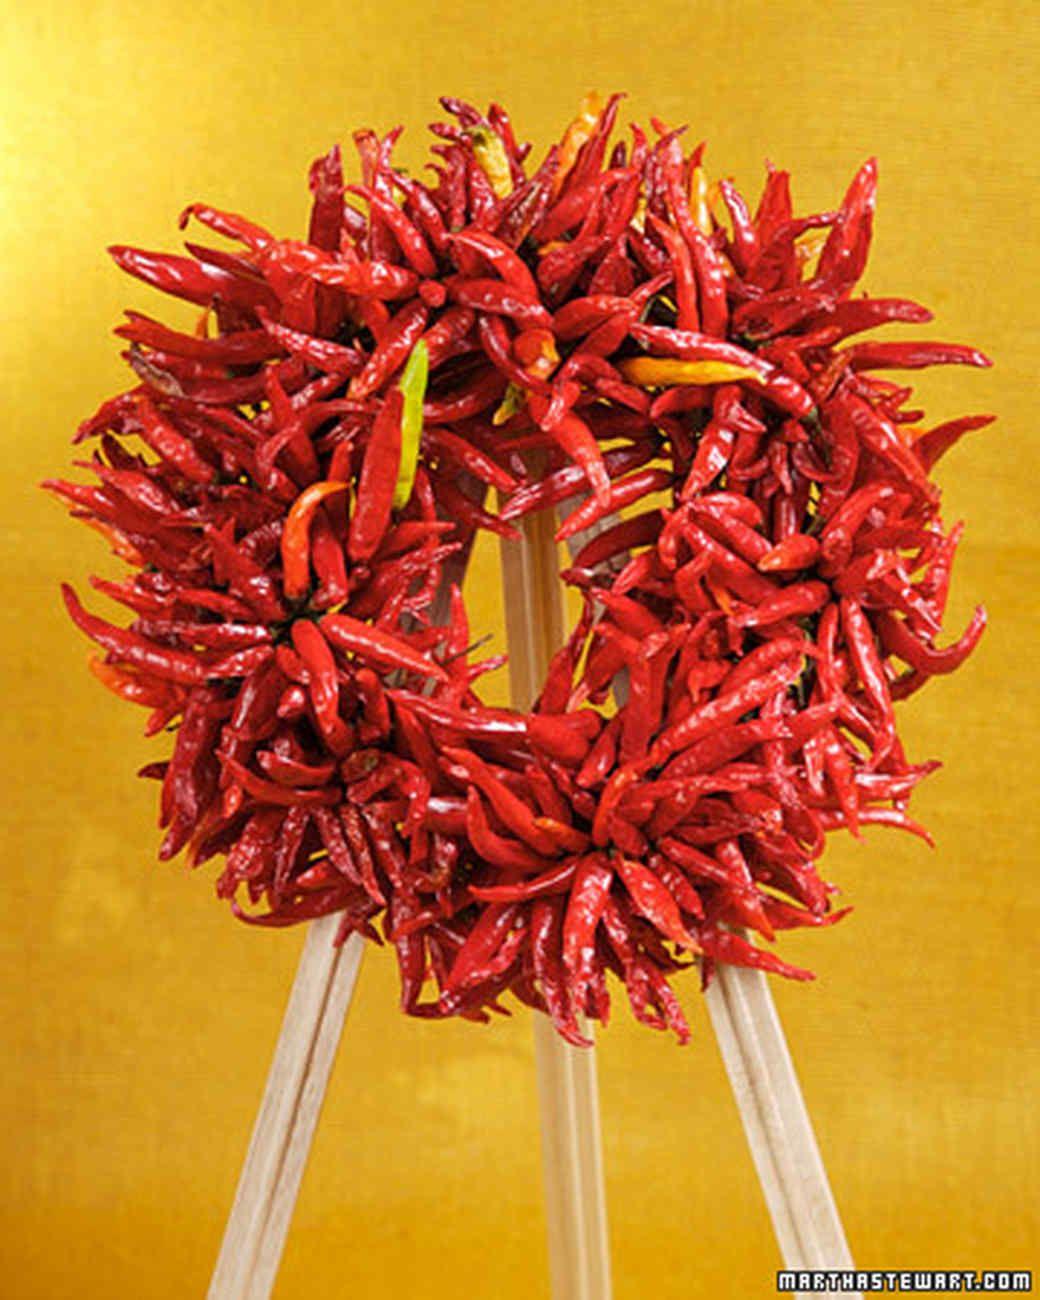 Chile-Pepper Wreath  sc 1 st  Pinterest & Chile-Pepper Wreath   Martha stewart Wreaths and Pepper pezcame.com